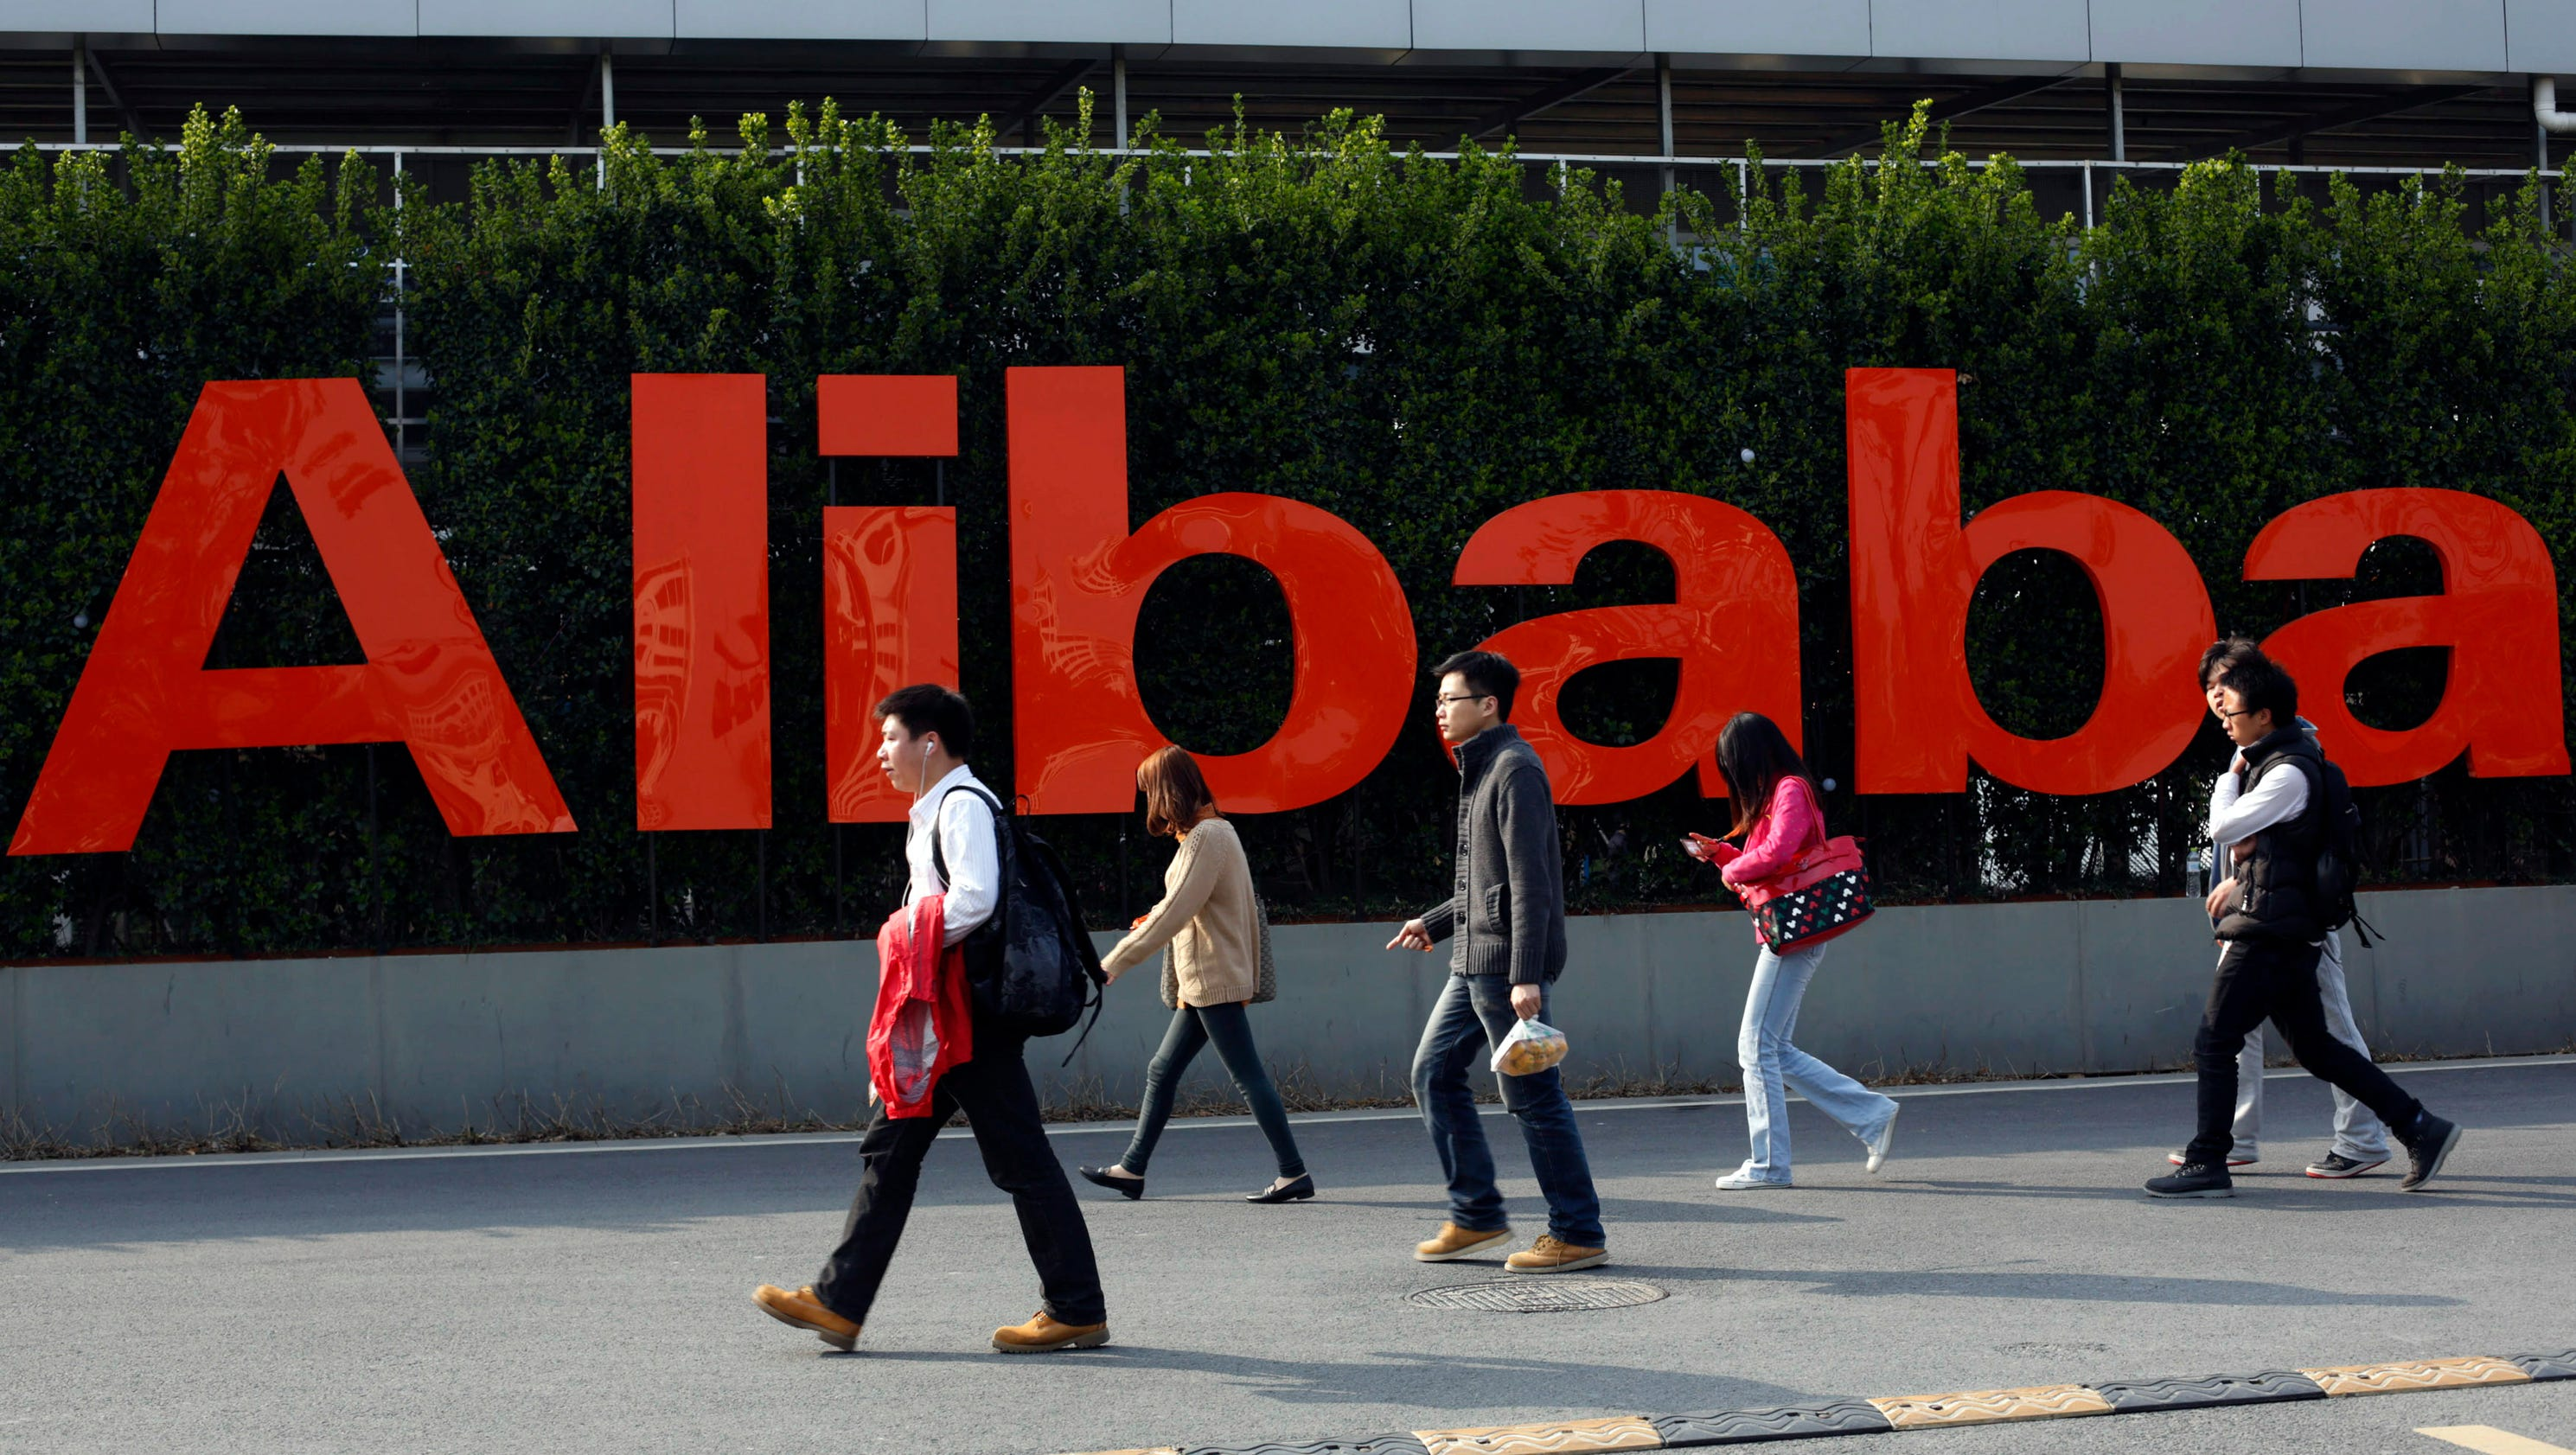 alibaba - photo #12